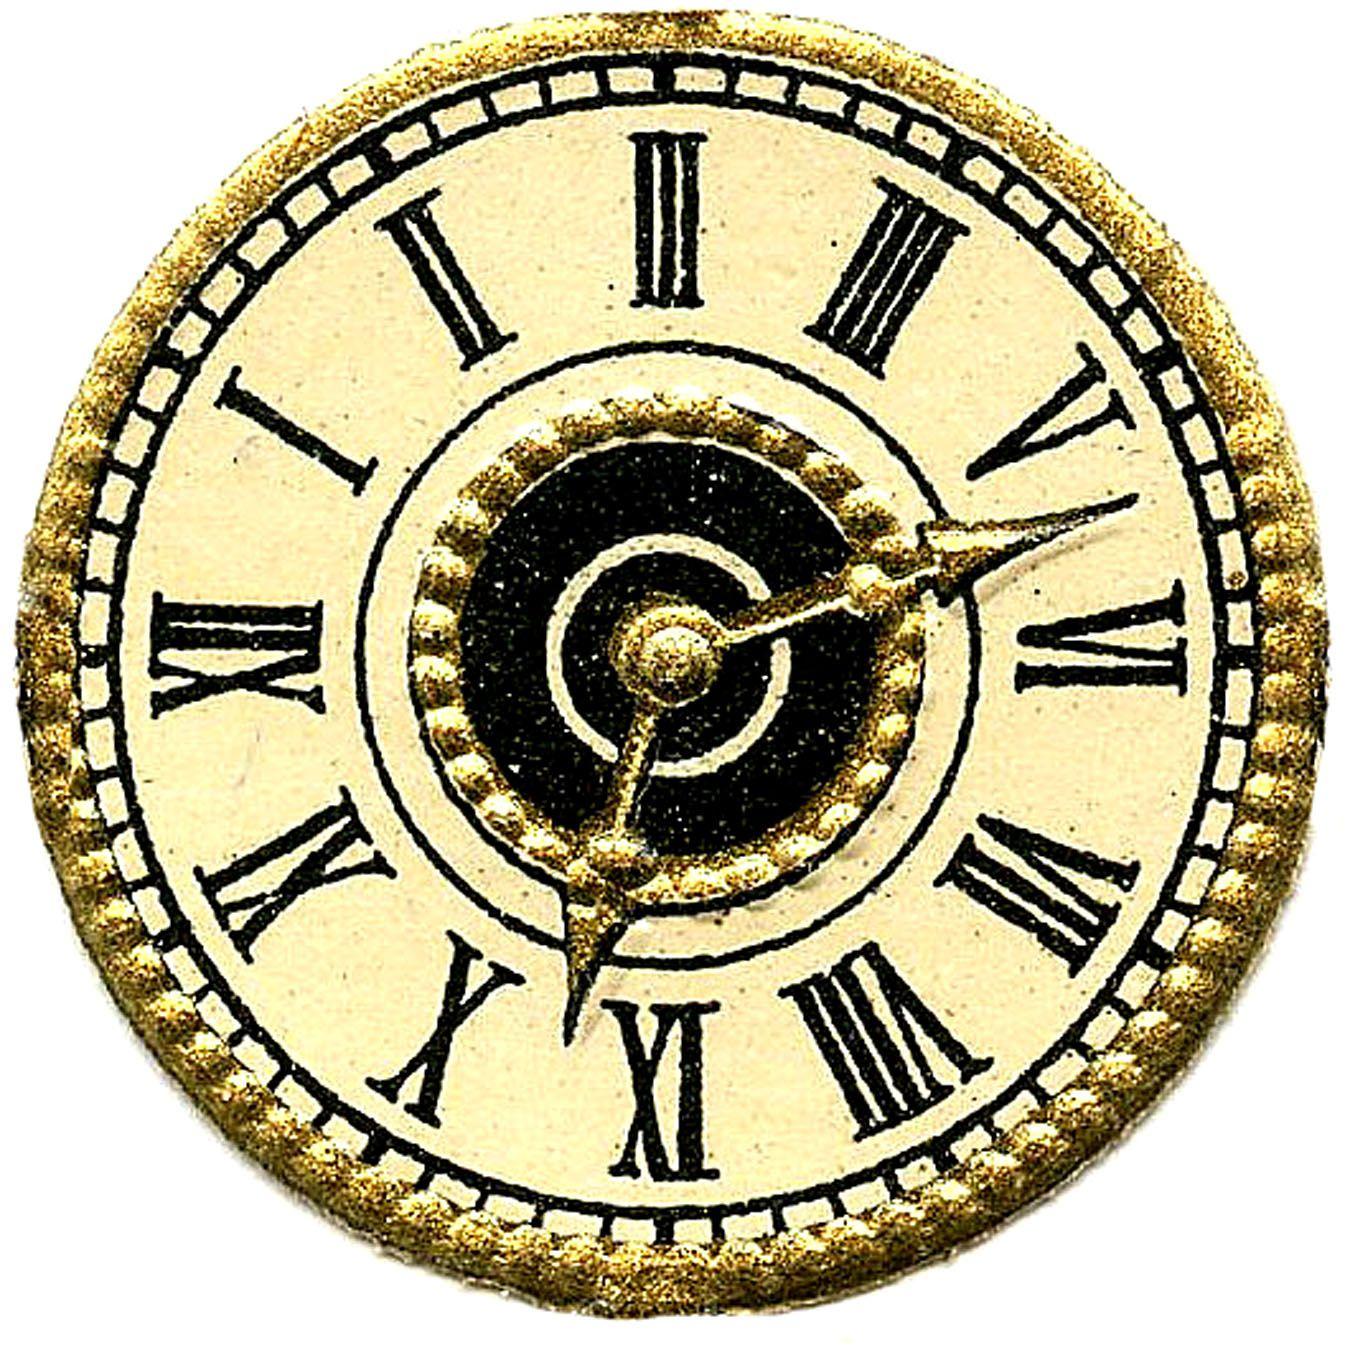 Vintage Images More Cute Clock Faces Steampunk Clock